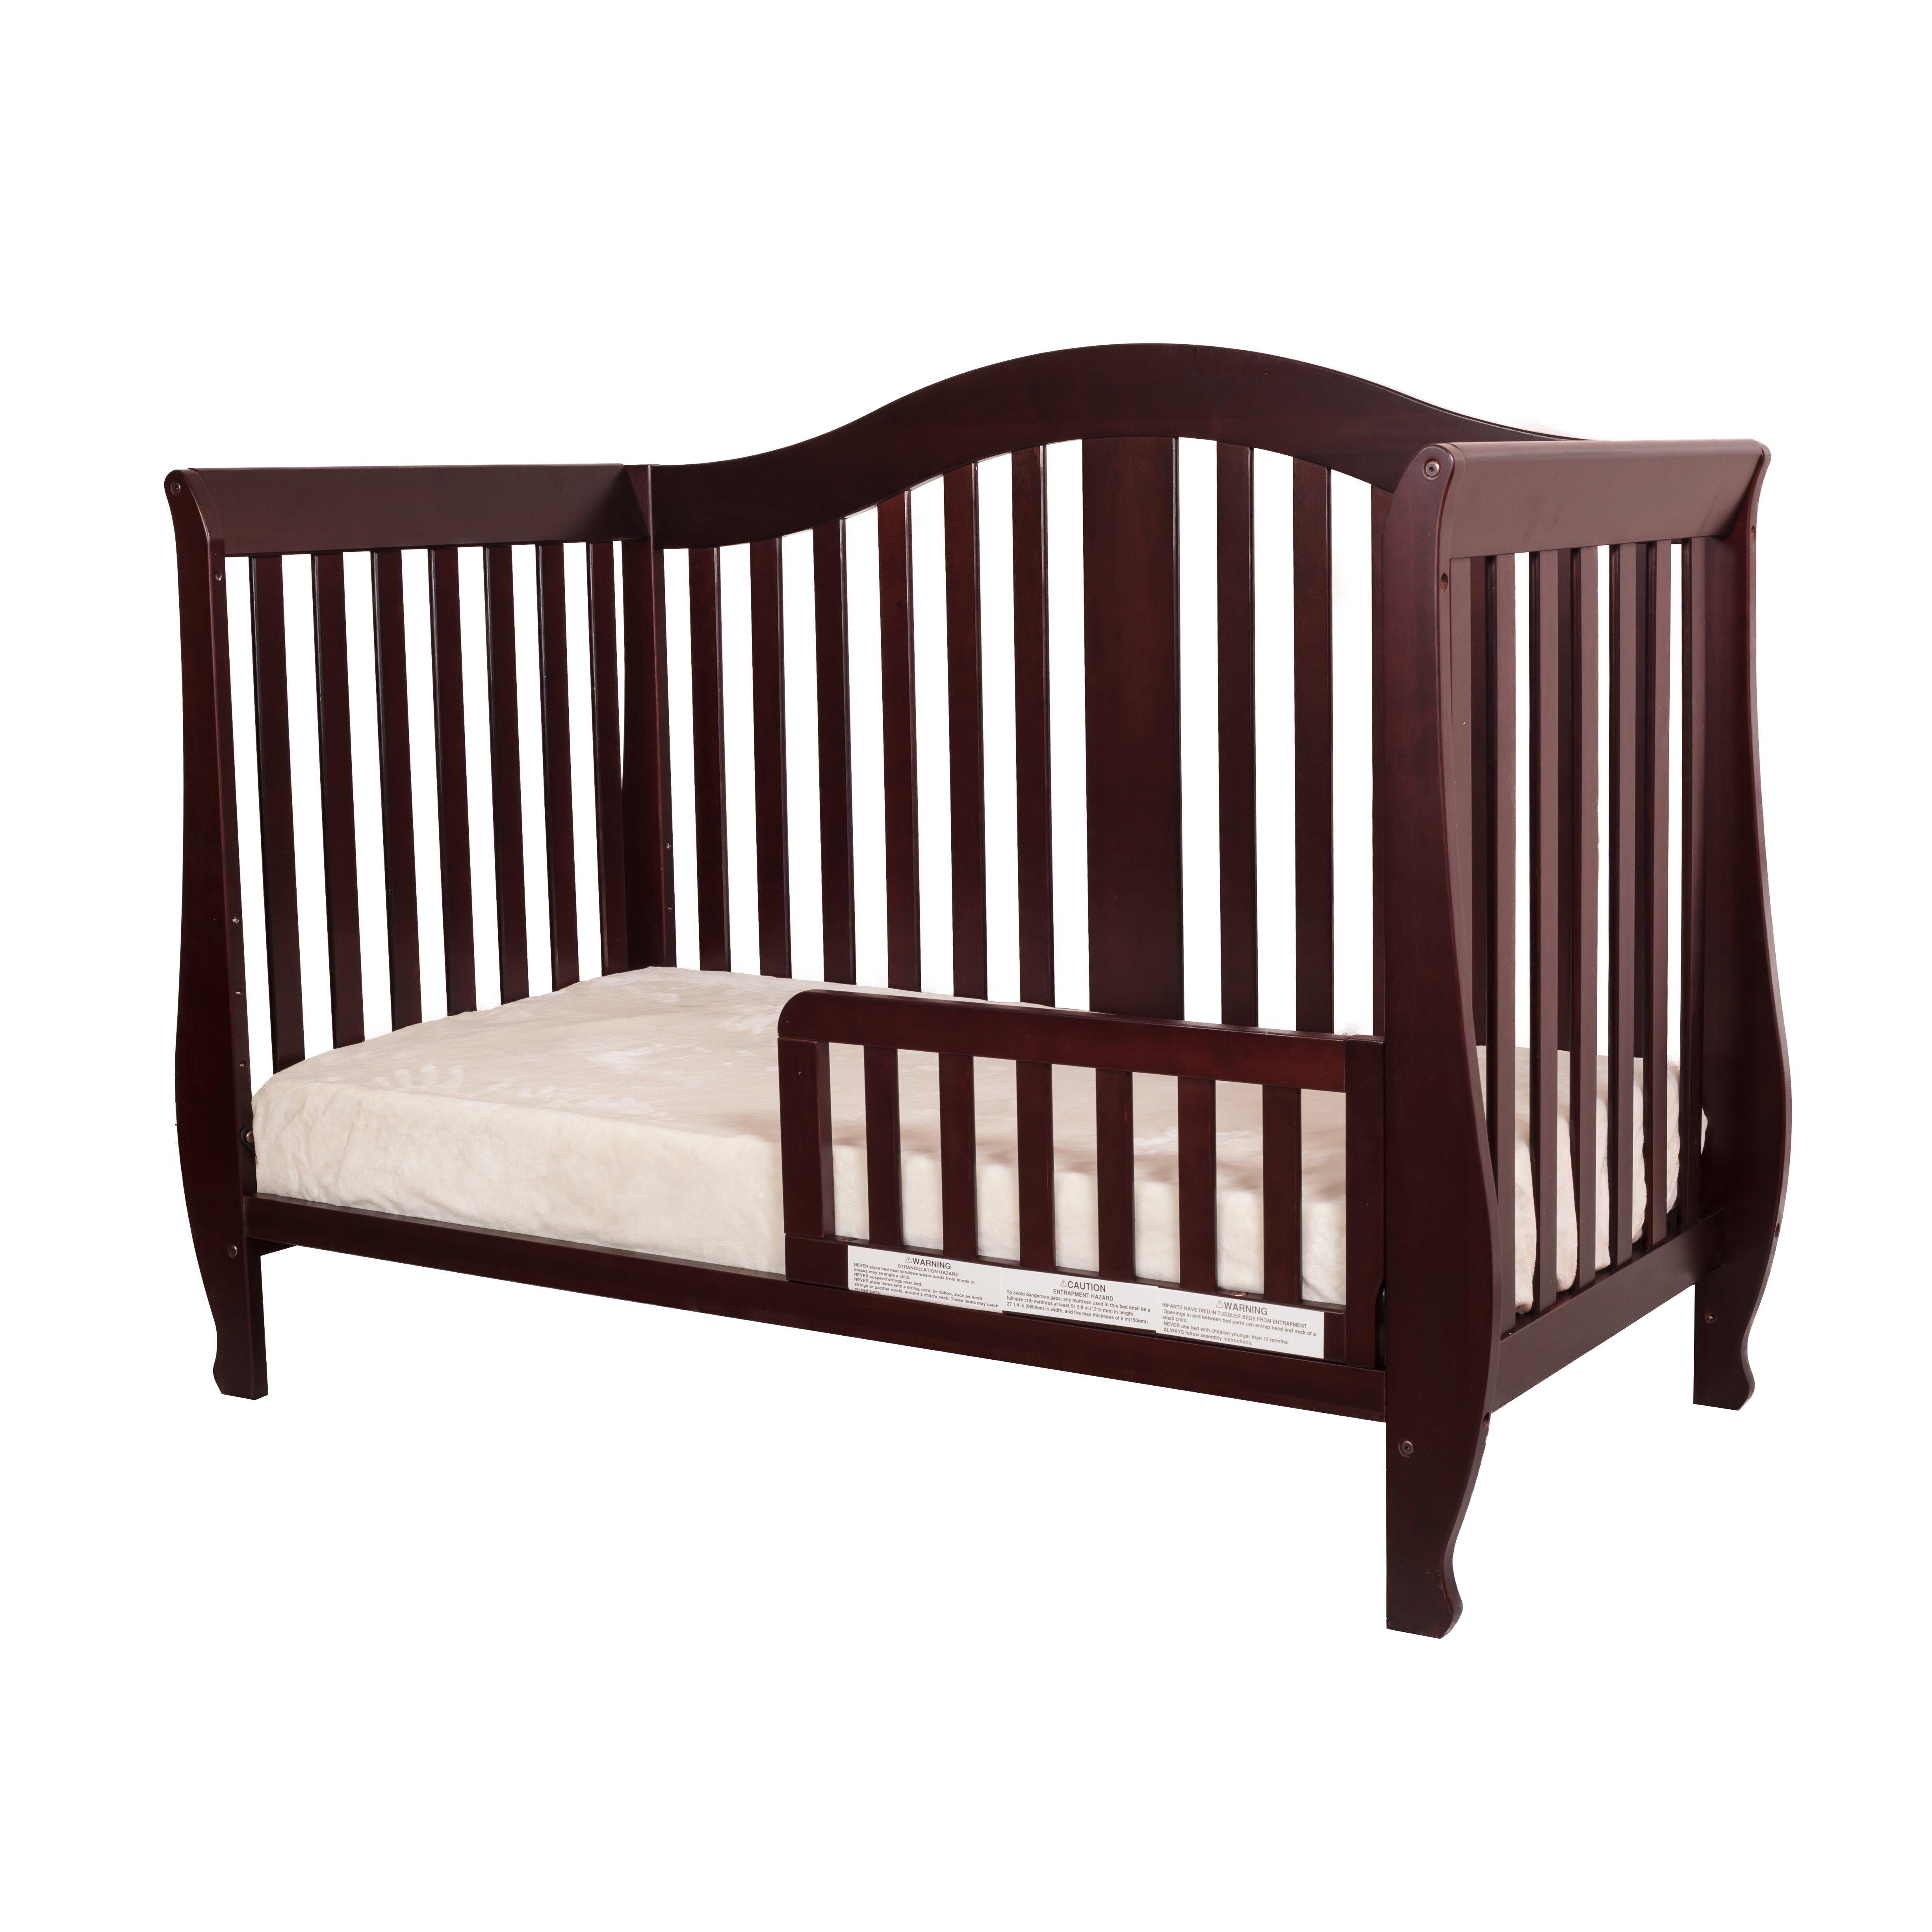 100 Black Friday Baby Furniture